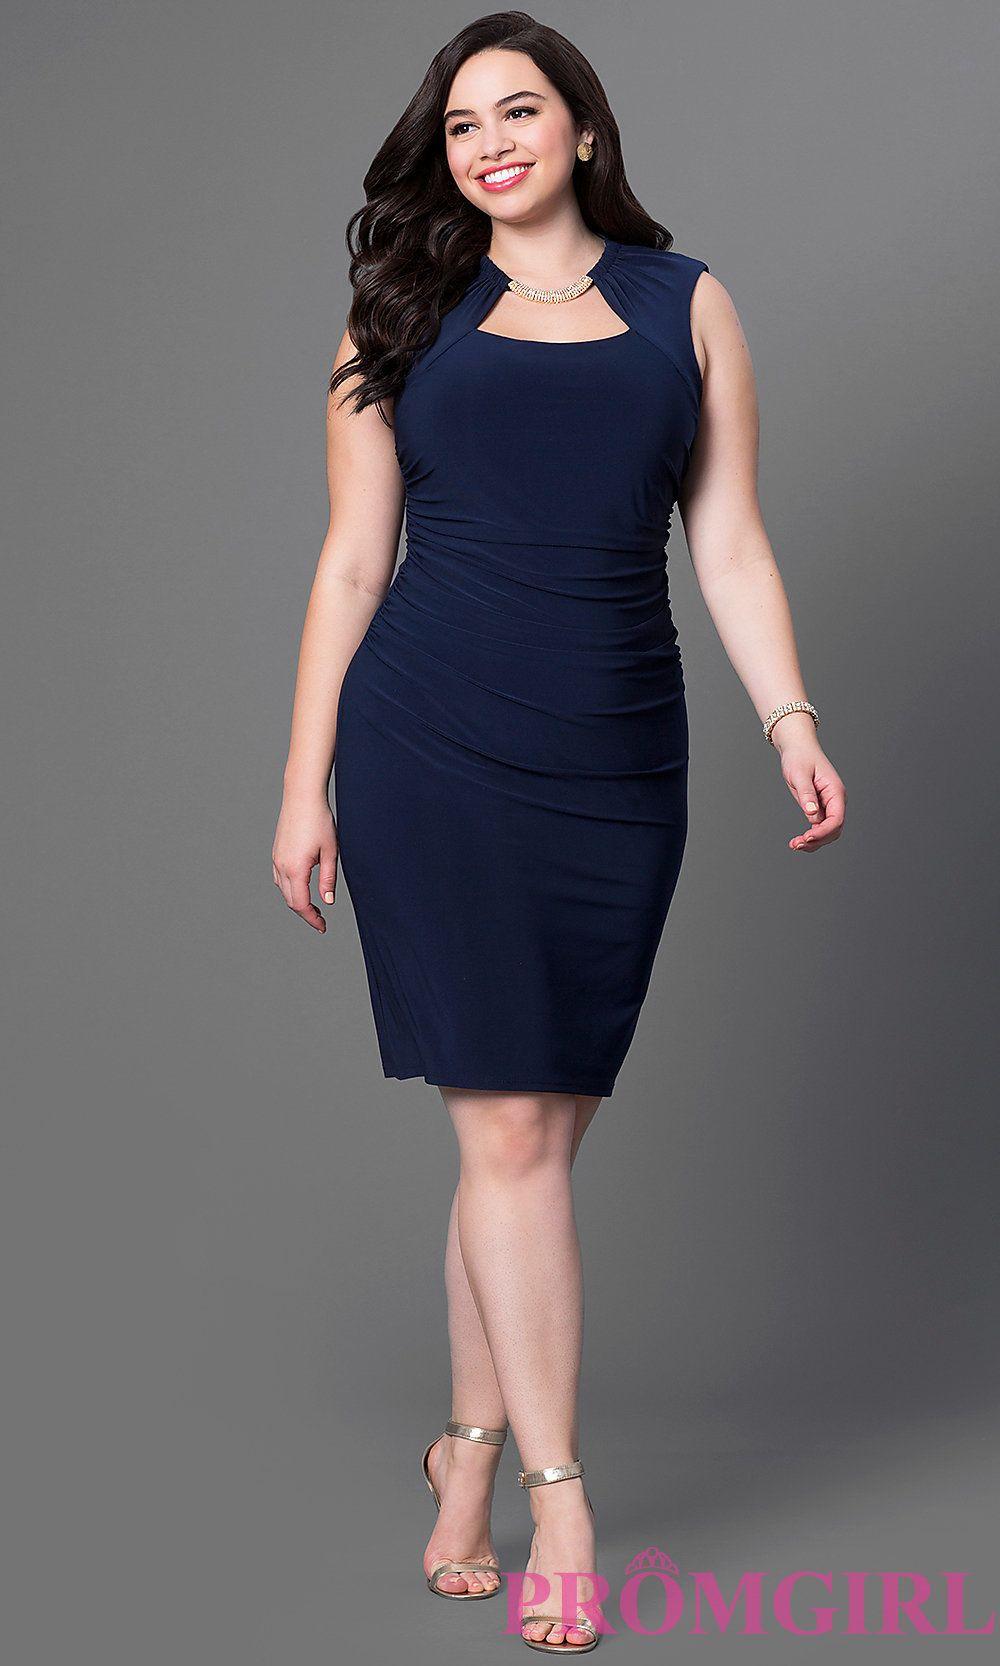 Sleeveless Ruched Short Dress En 2019 Vestidos Para